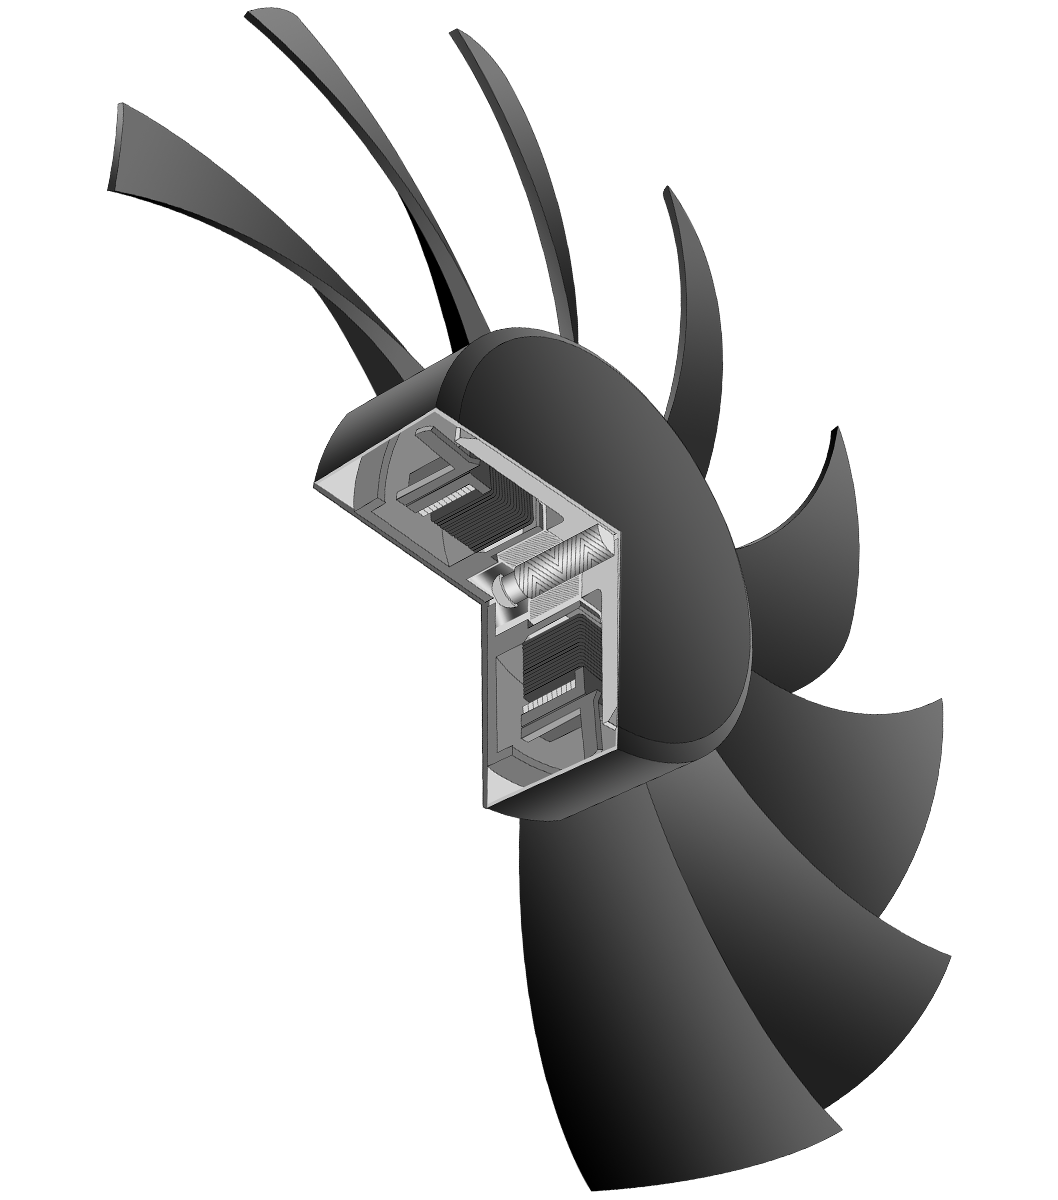 Power SeaSonic 520W S12II-520